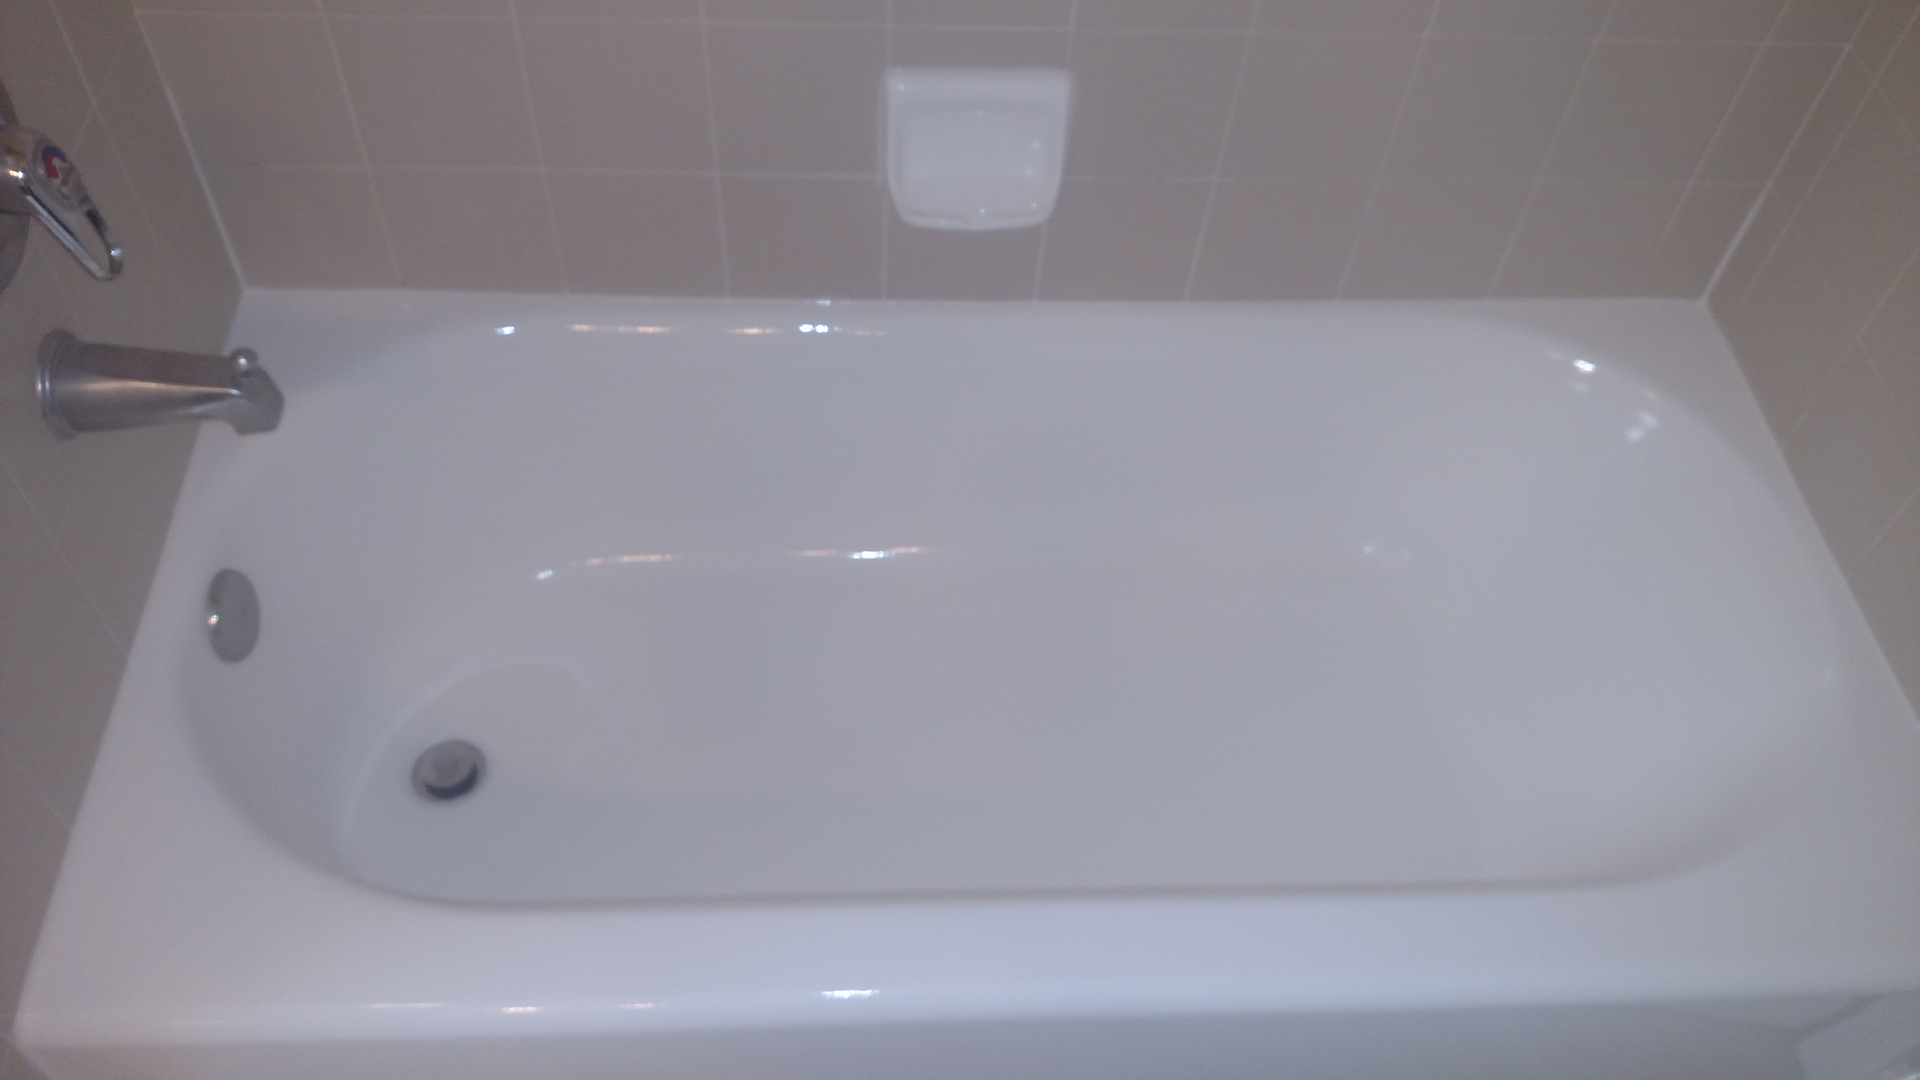 Bathtub Resurfacing, Bathtub Refinishing - American Standard ...